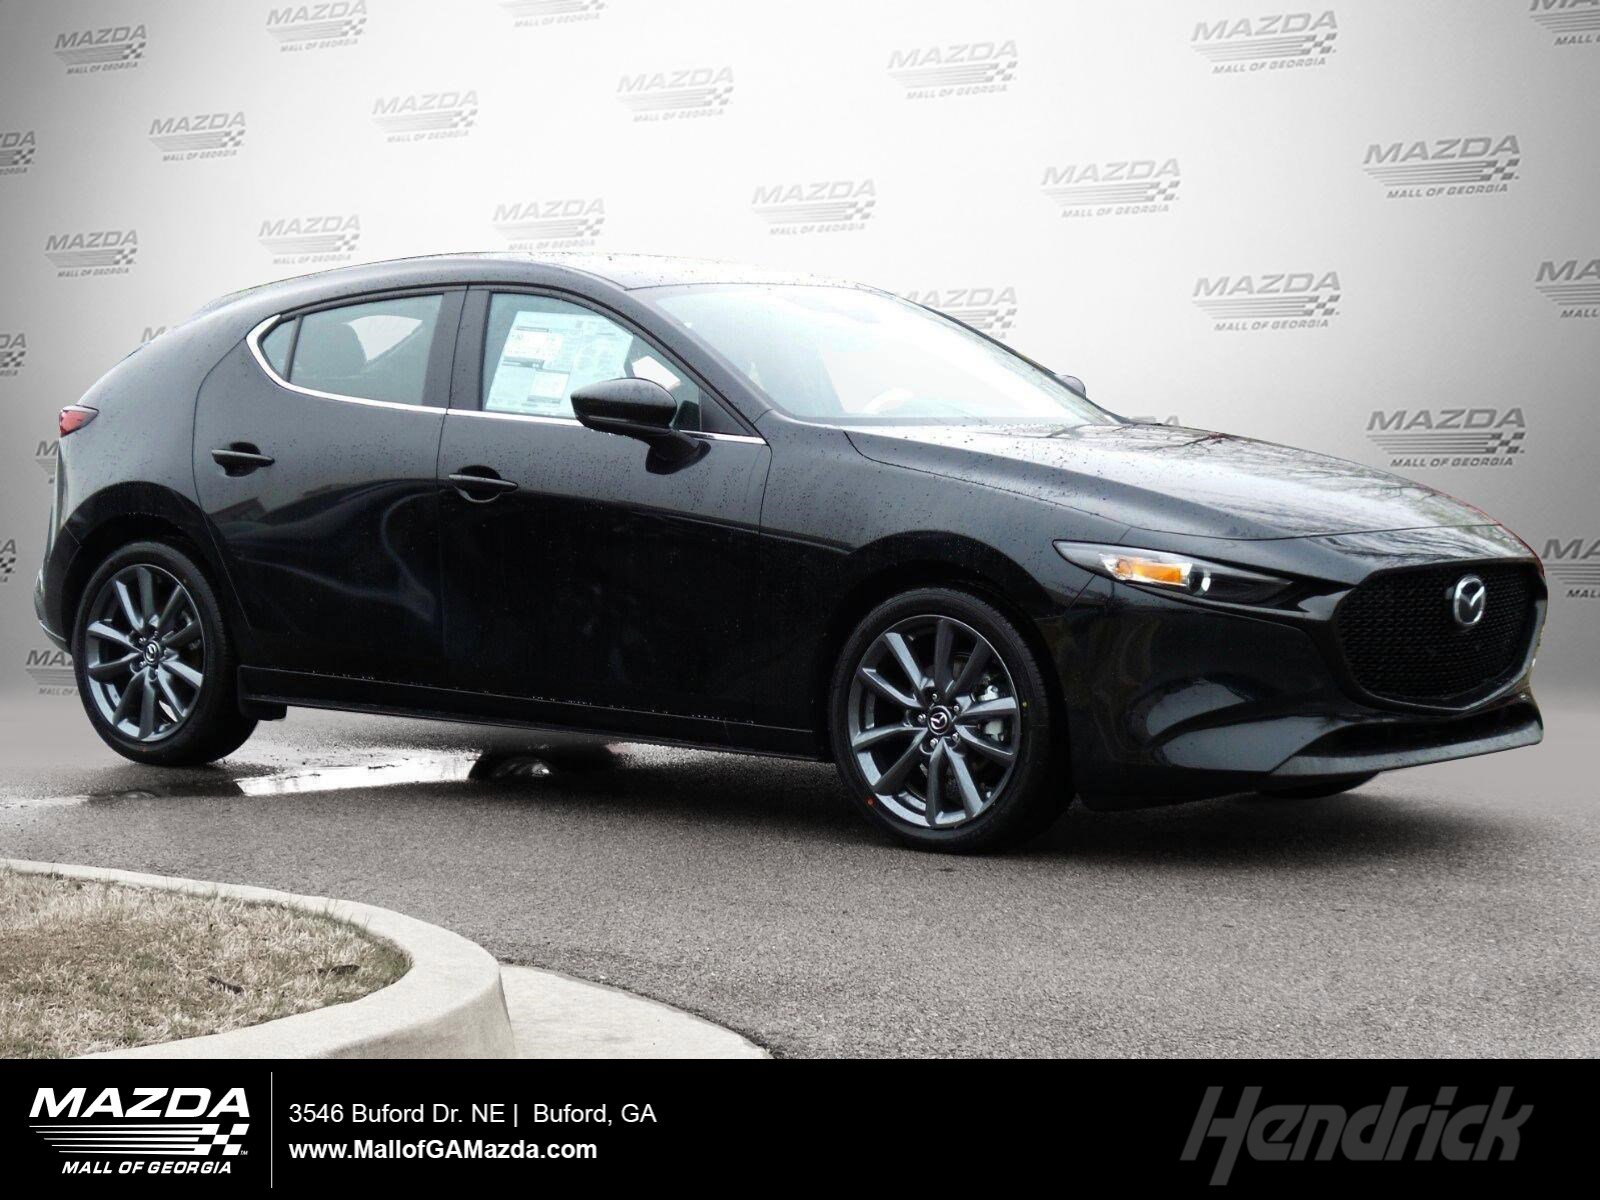 New 2020 Mazda3 Hatchback FWD Auto